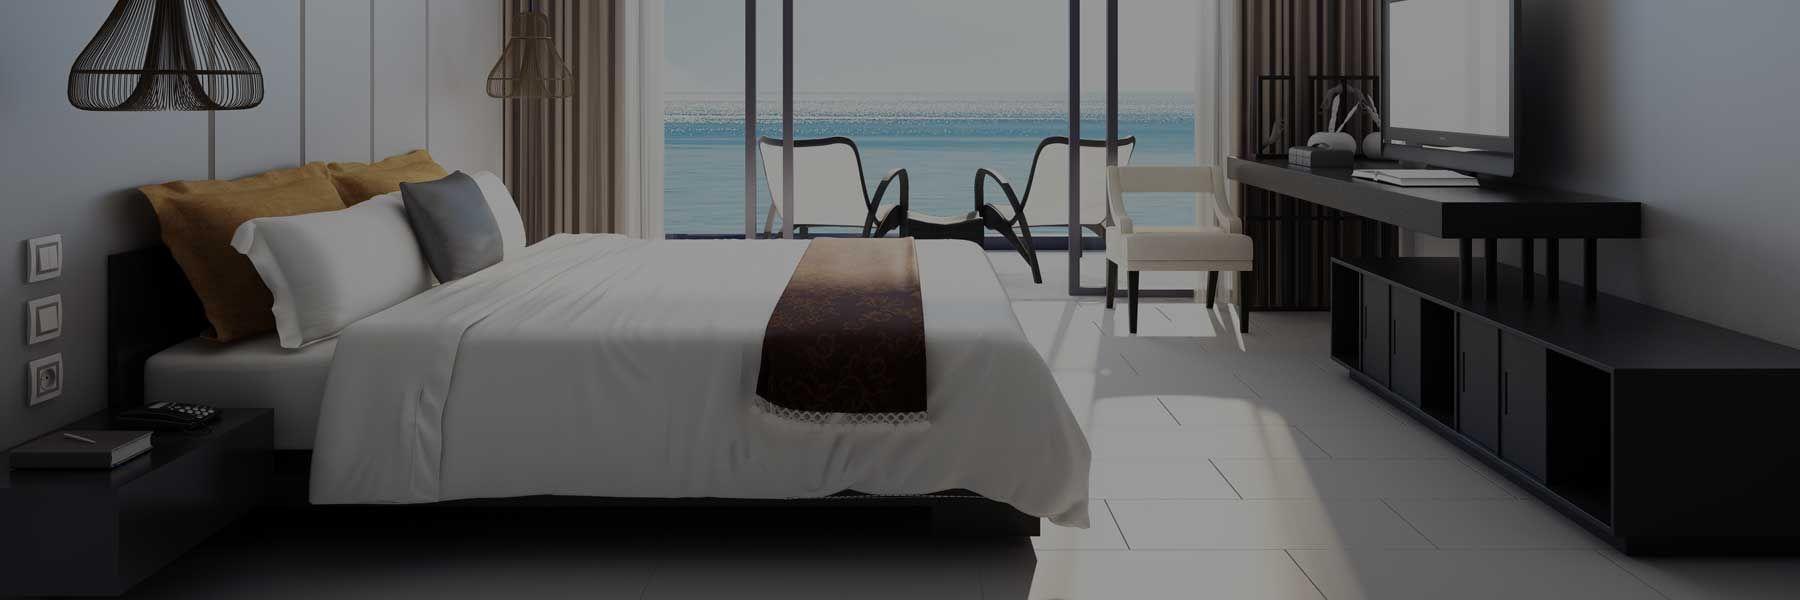 Hospitality Industry Renovations